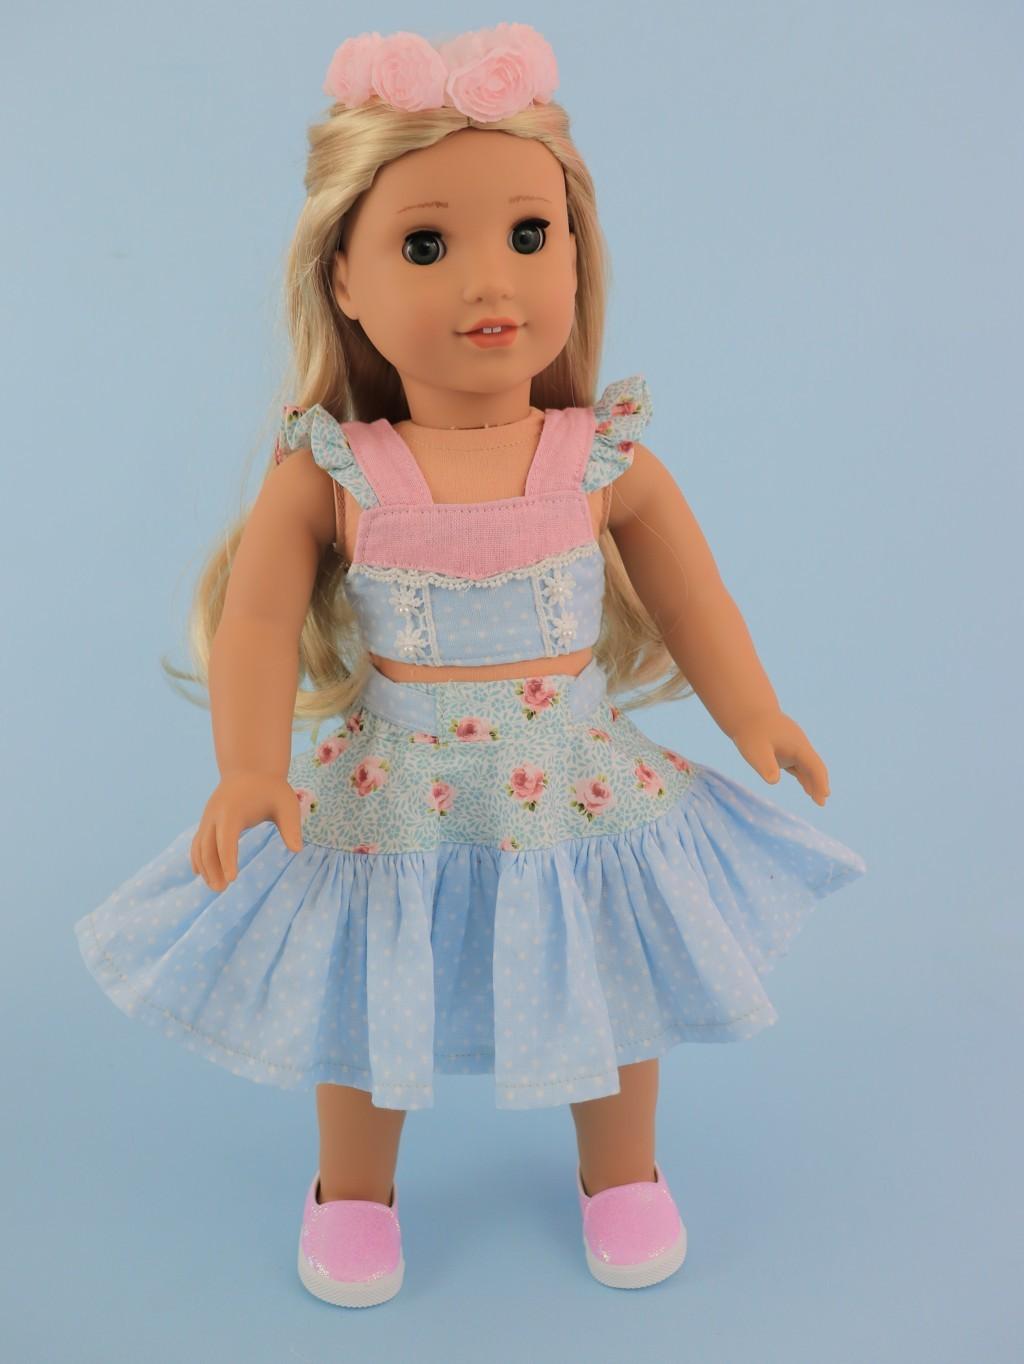 doll skirt sewing pattern, American doll, Frocks & Frolics